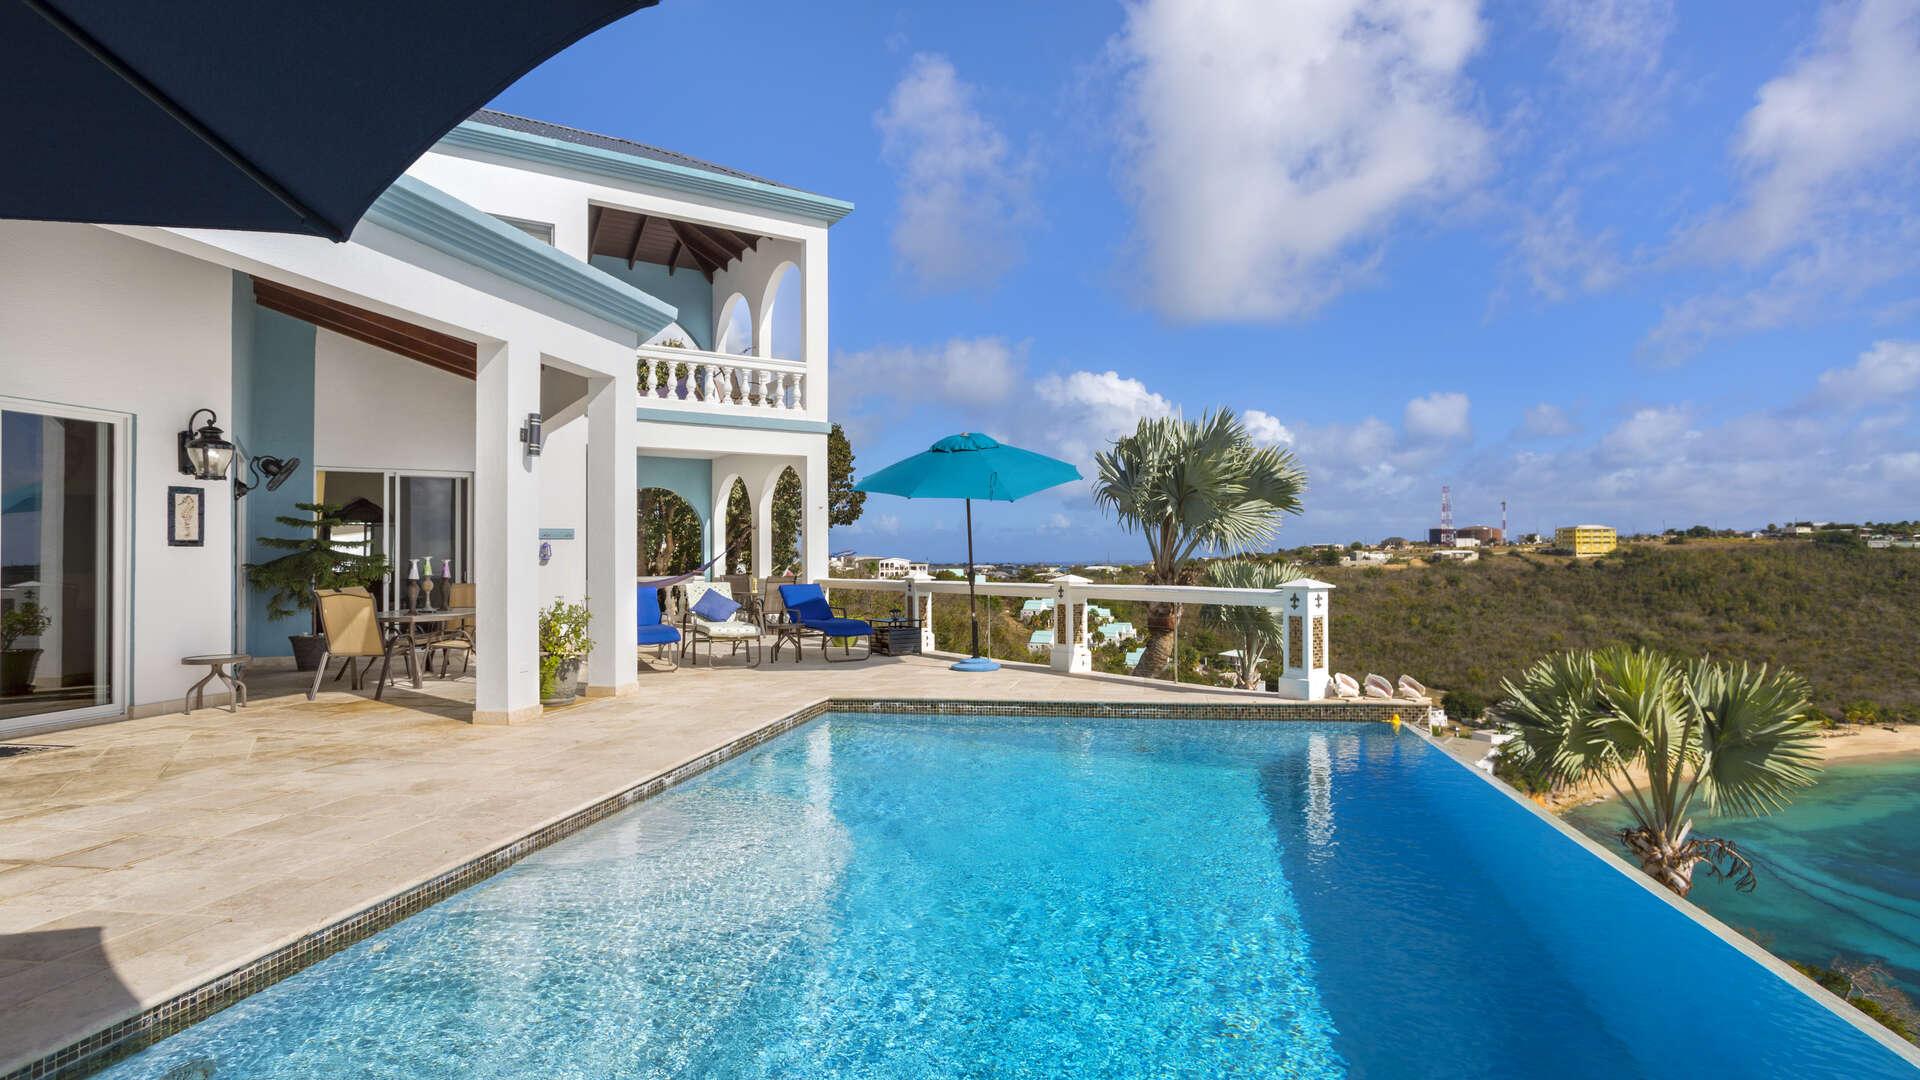 - Grand Outlook Villa - Image 1/56